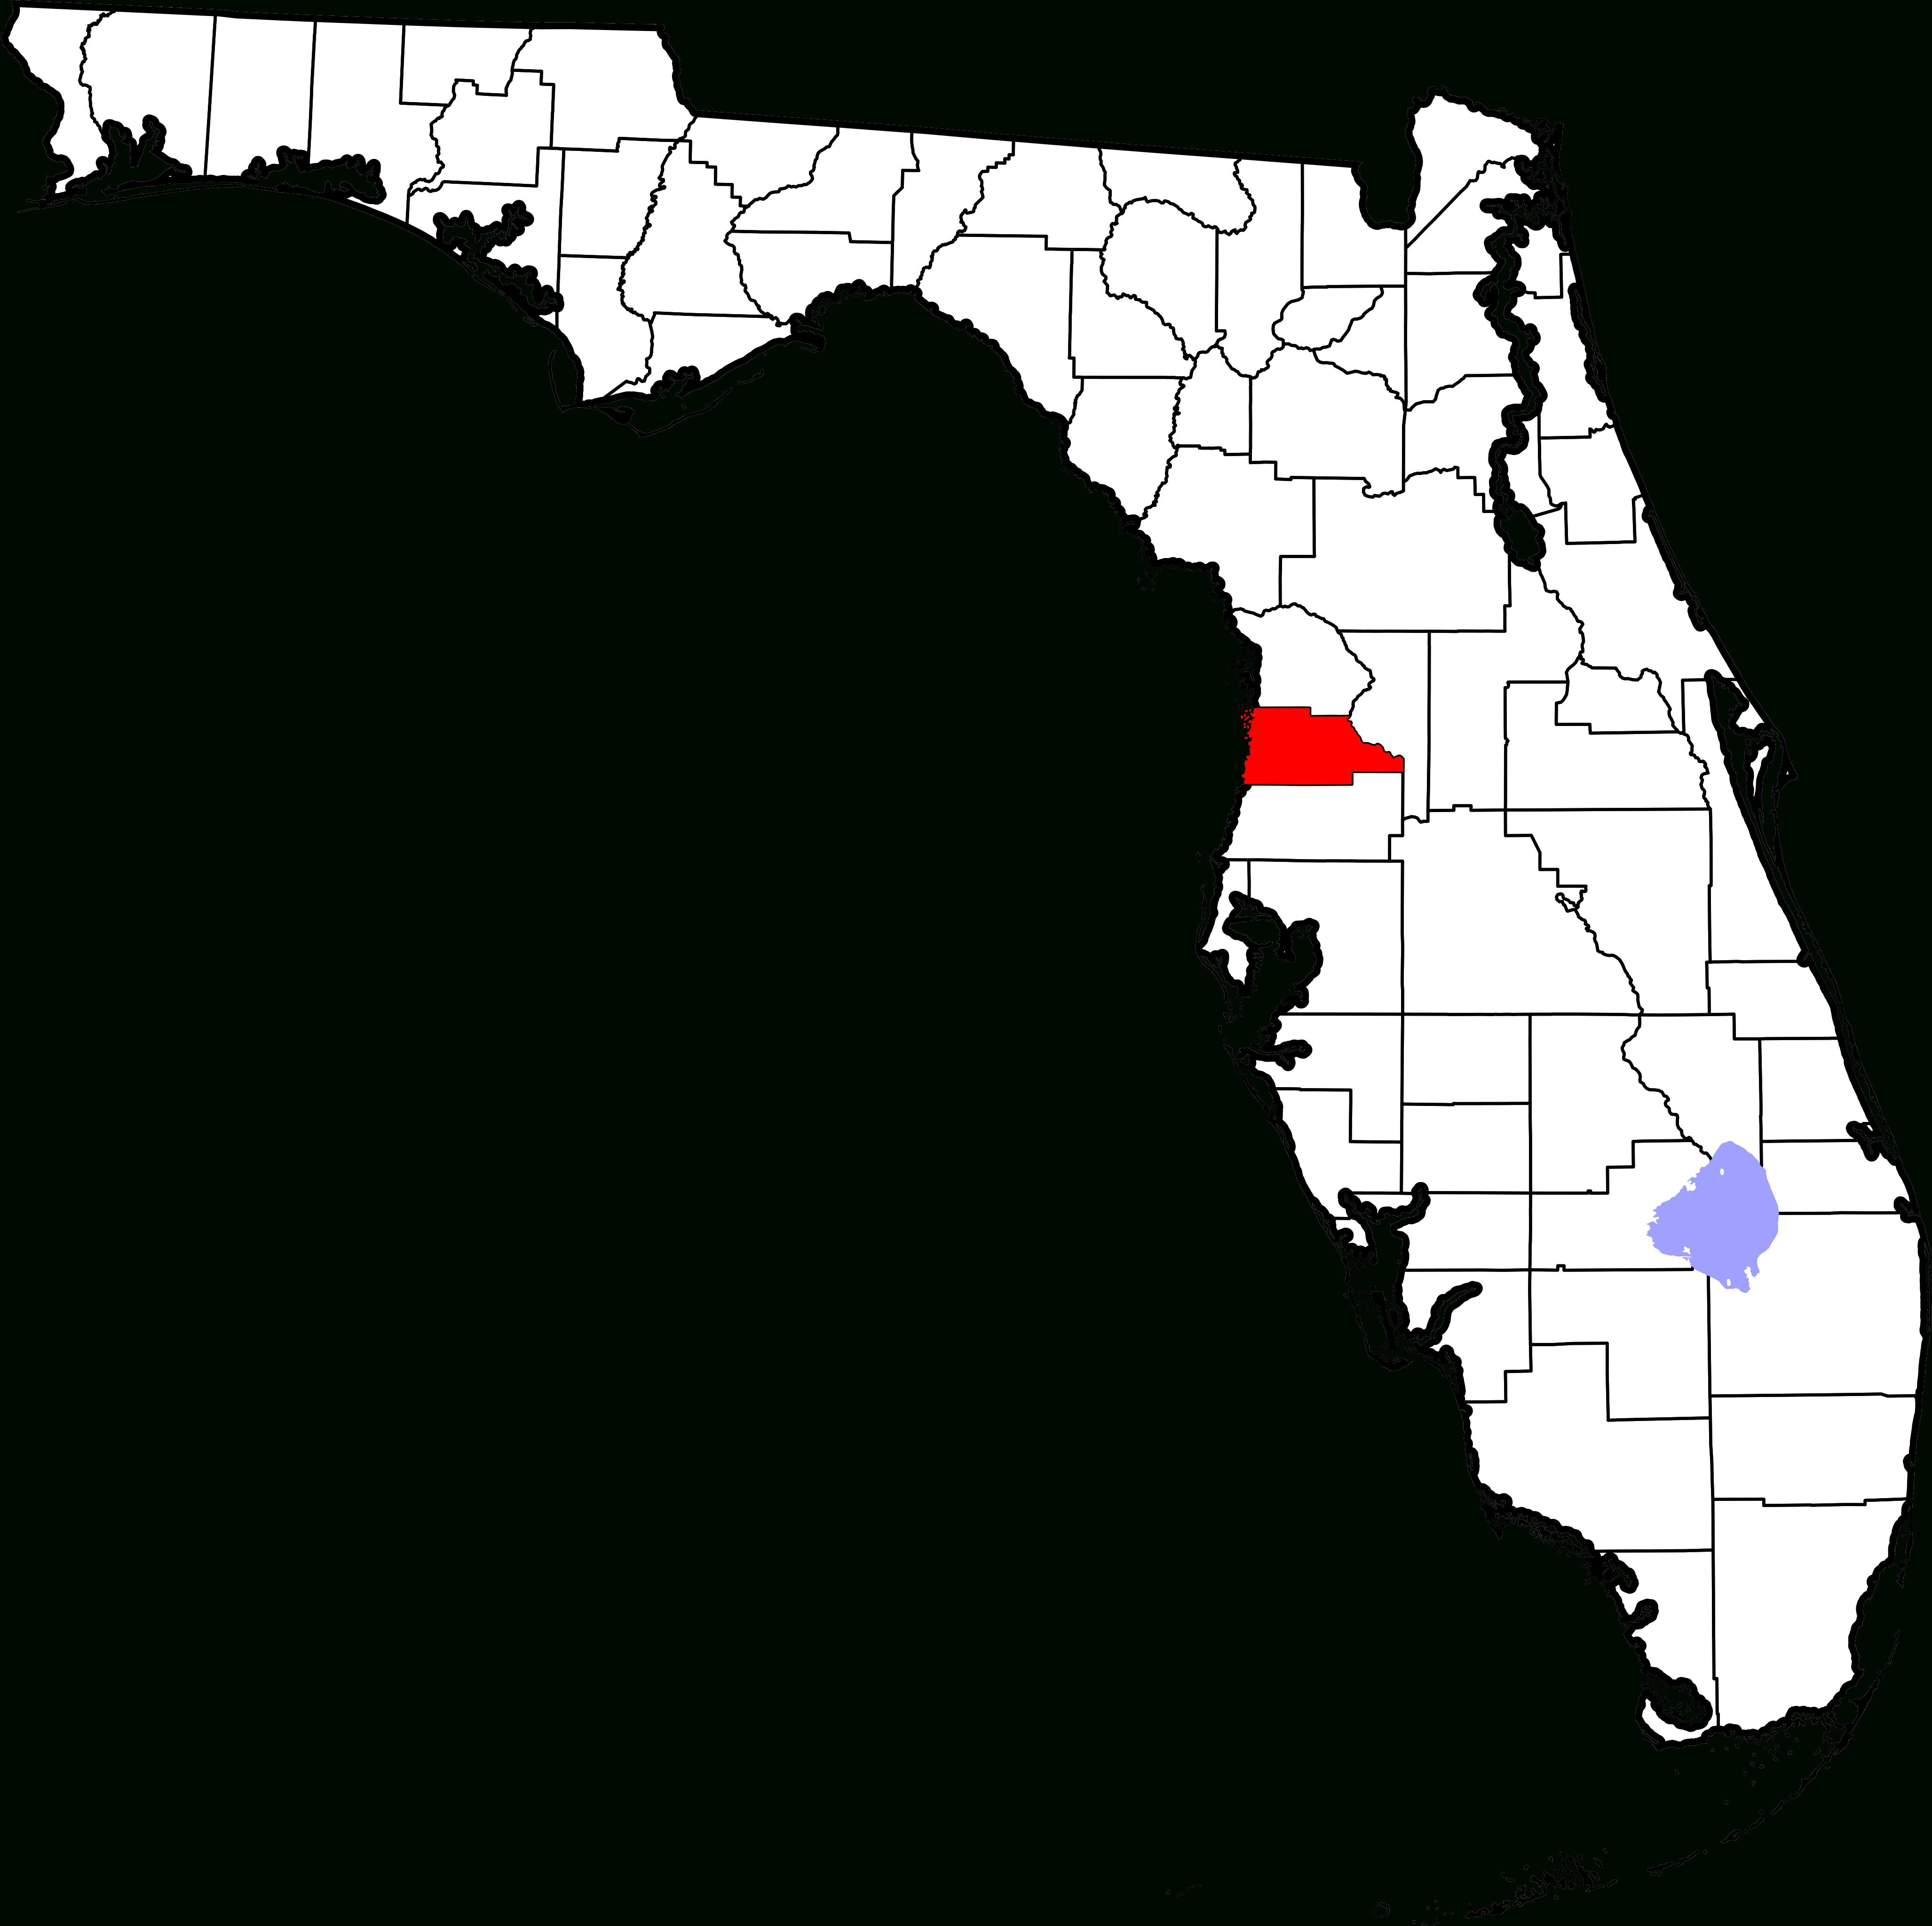 Fichier:map Of Florida Highlighting Hernando County.svg — Wikipédia - Hernando Florida Map